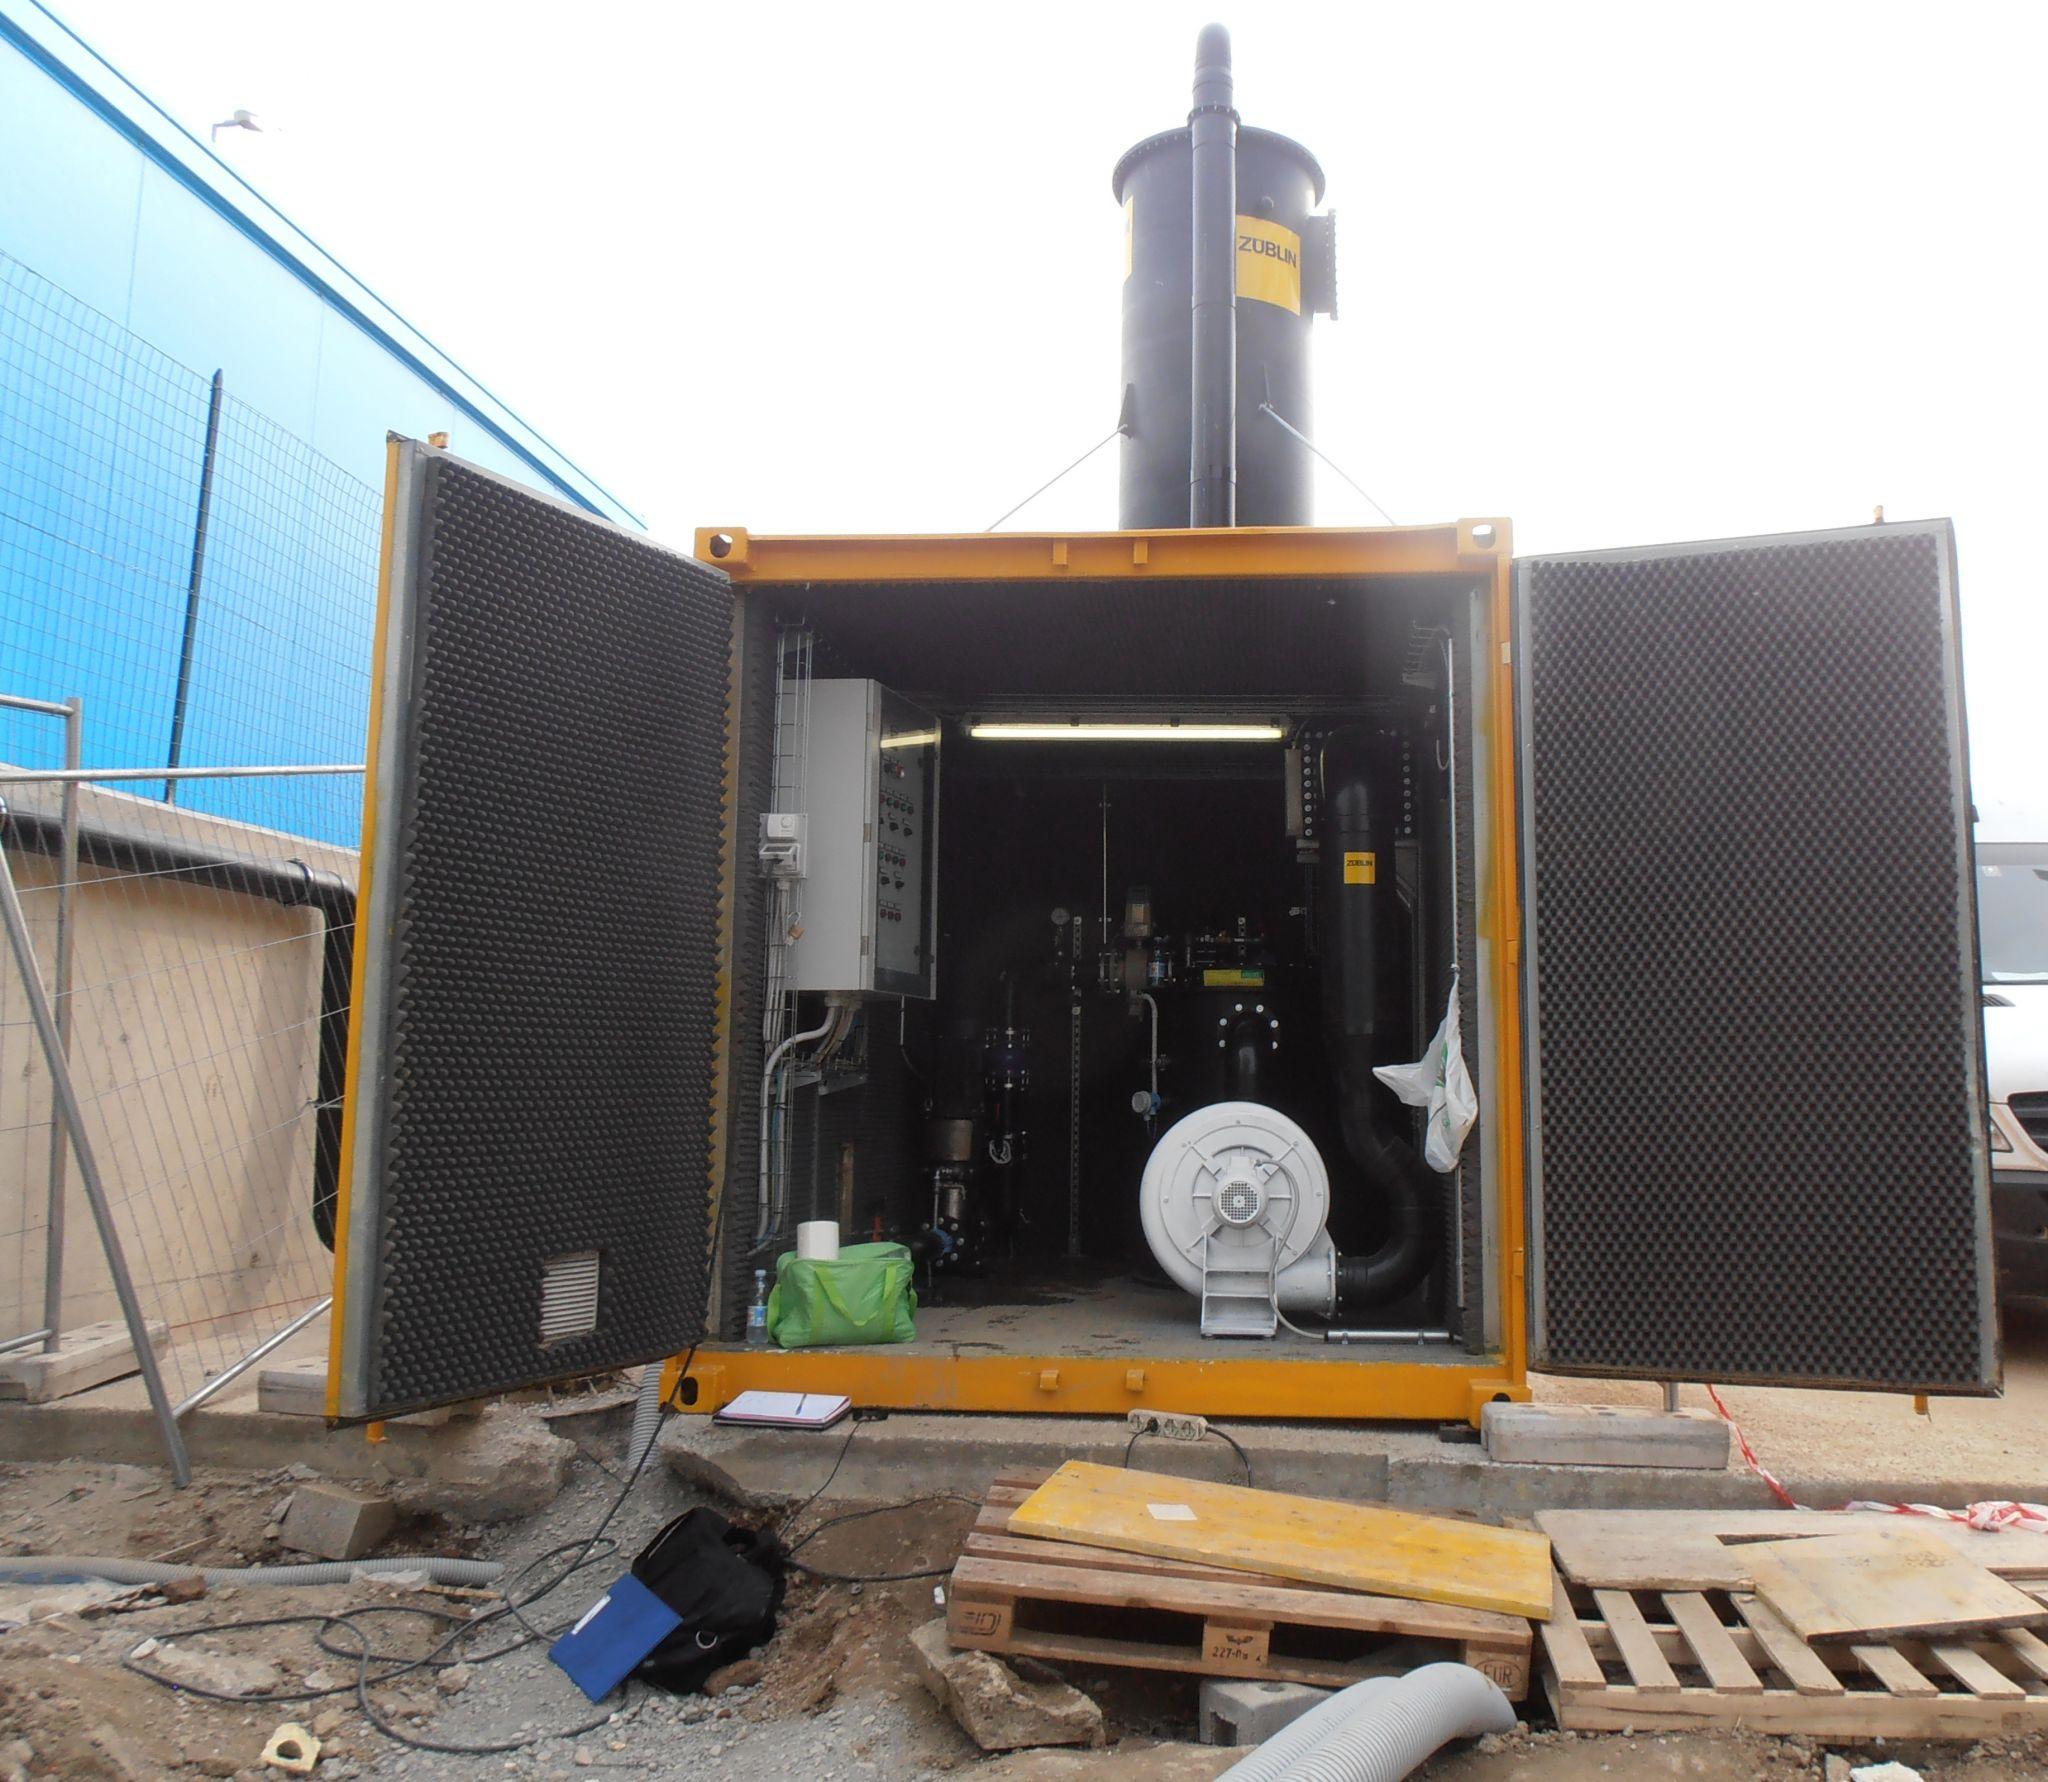 tethys - siti contaminati - barriera idraulica per la messa in sicurezza d'emergenza